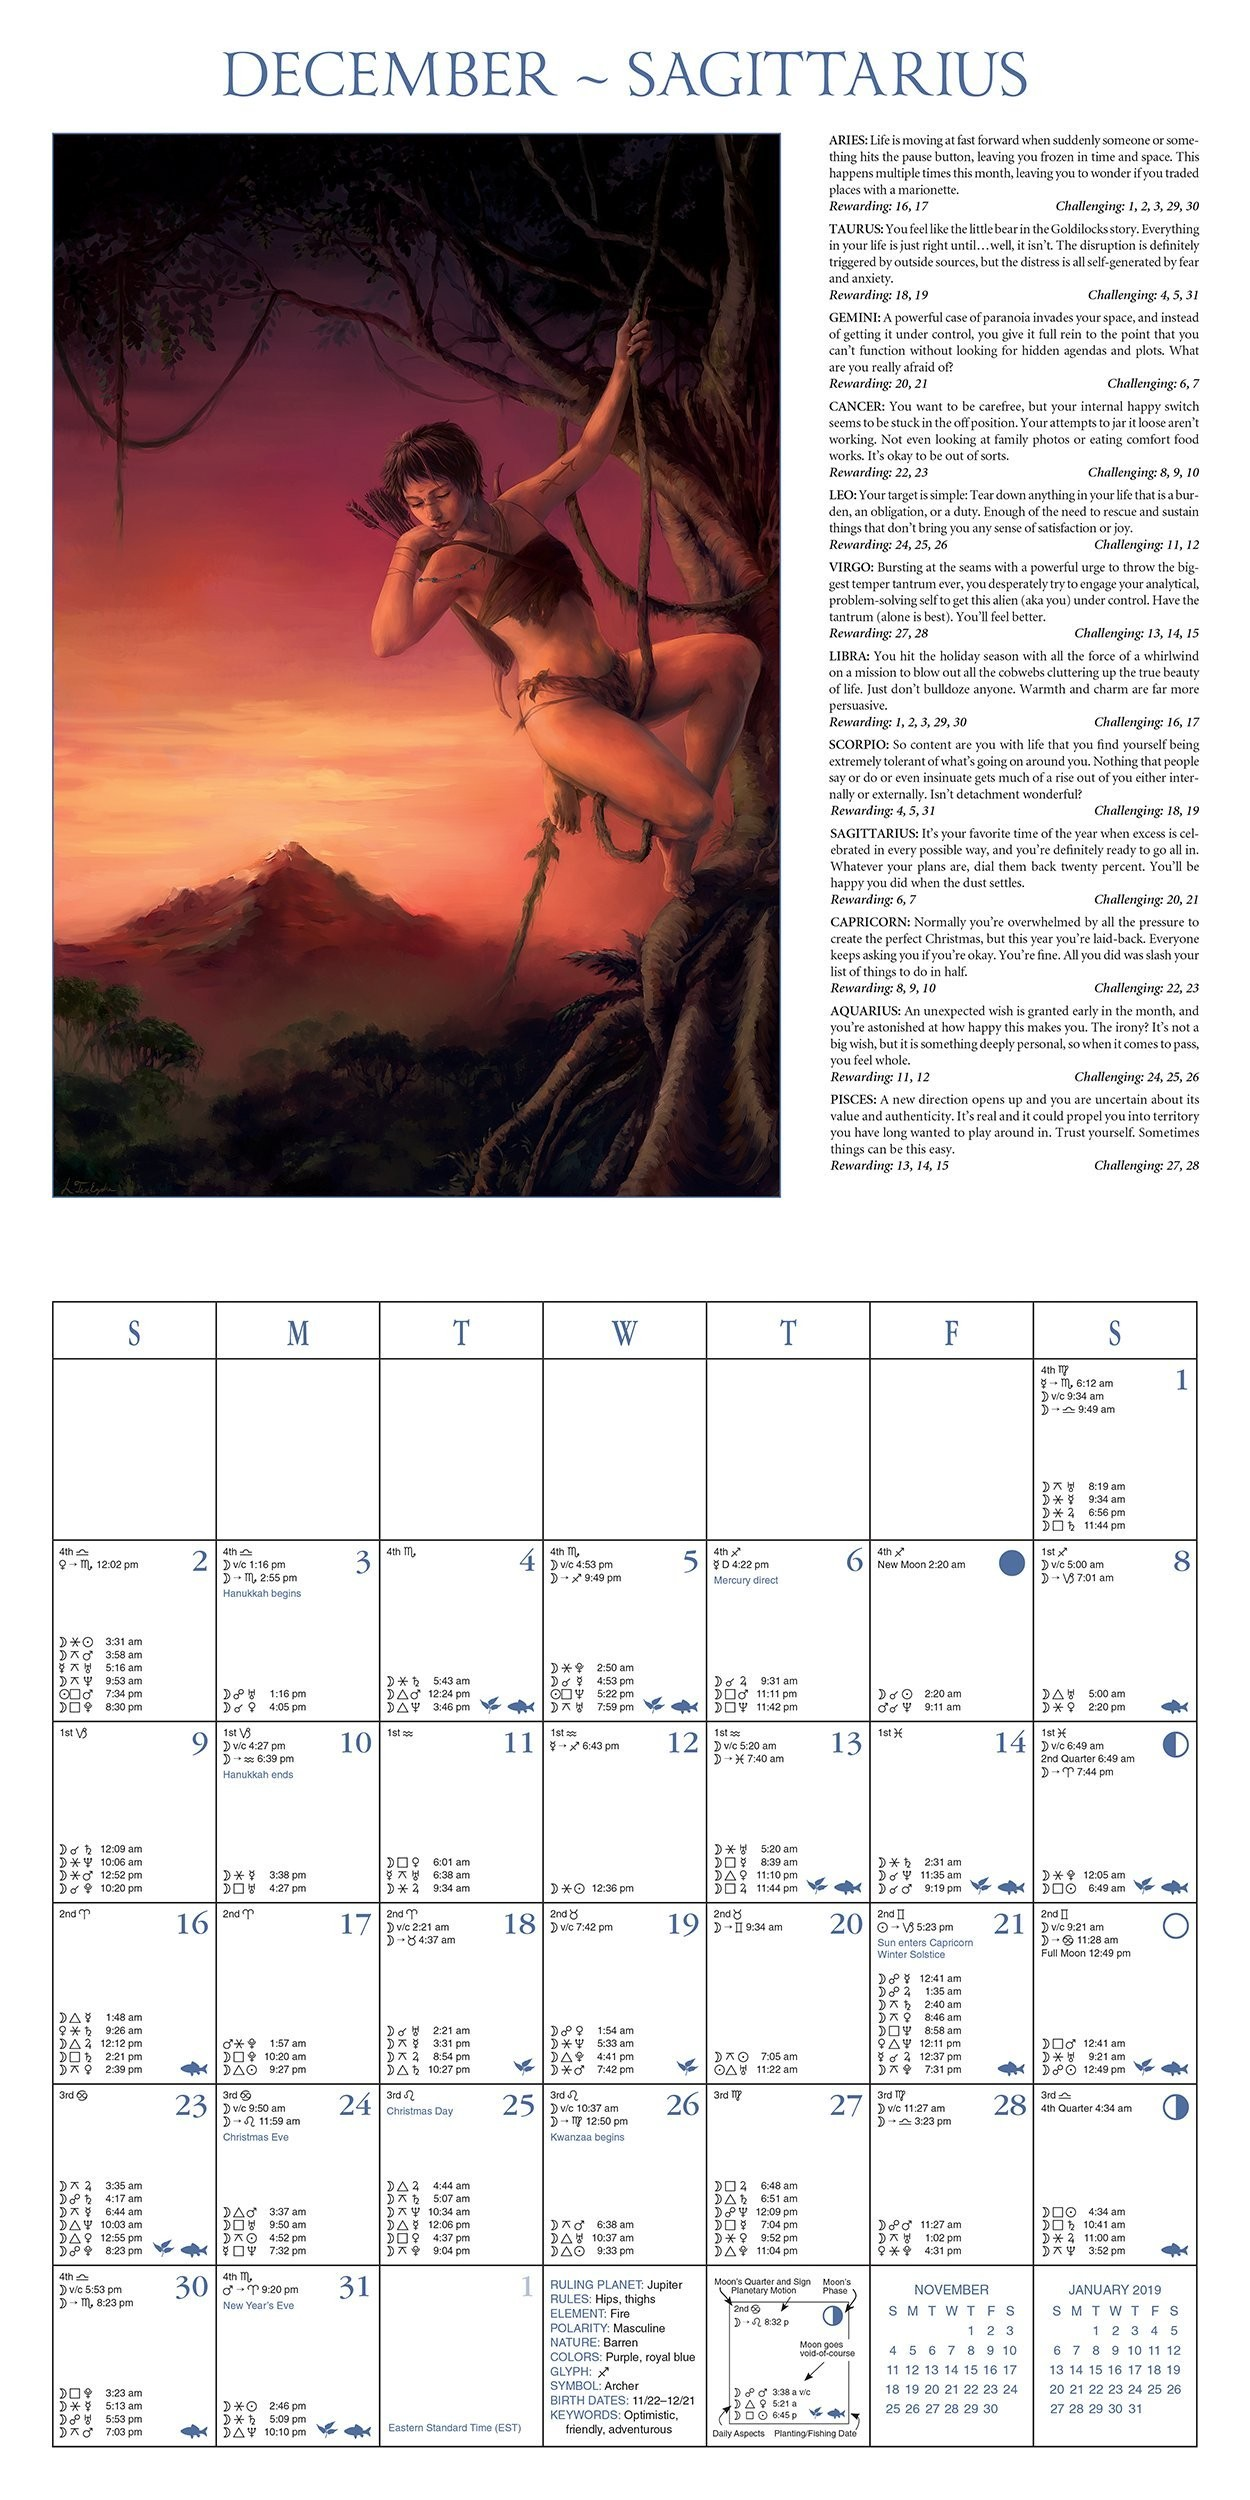 Calendario Lunar Diciembre 2019 Más Reciente astrological Calendar 2018 85th Edition Of the World S Best Known Of Calendario Lunar Diciembre 2019 Más Populares Nautical Free Free Nautical Charts & Publications No Image Version